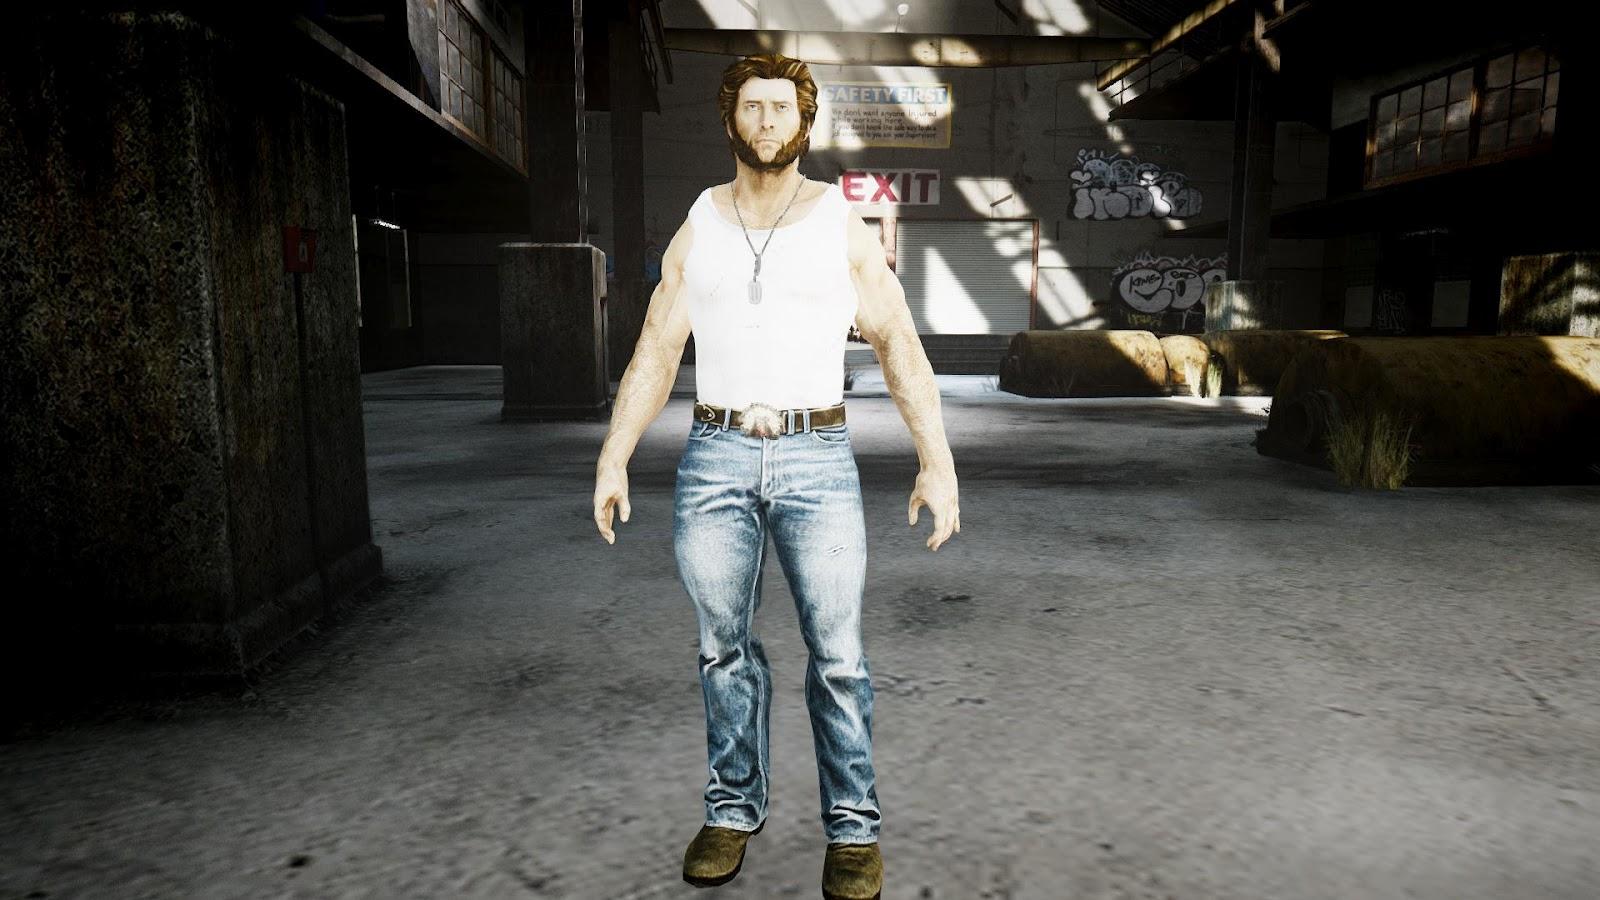 GTA 5,GTAV,GTA IV Mods And Skins: X Men Origins Wolverine Pack